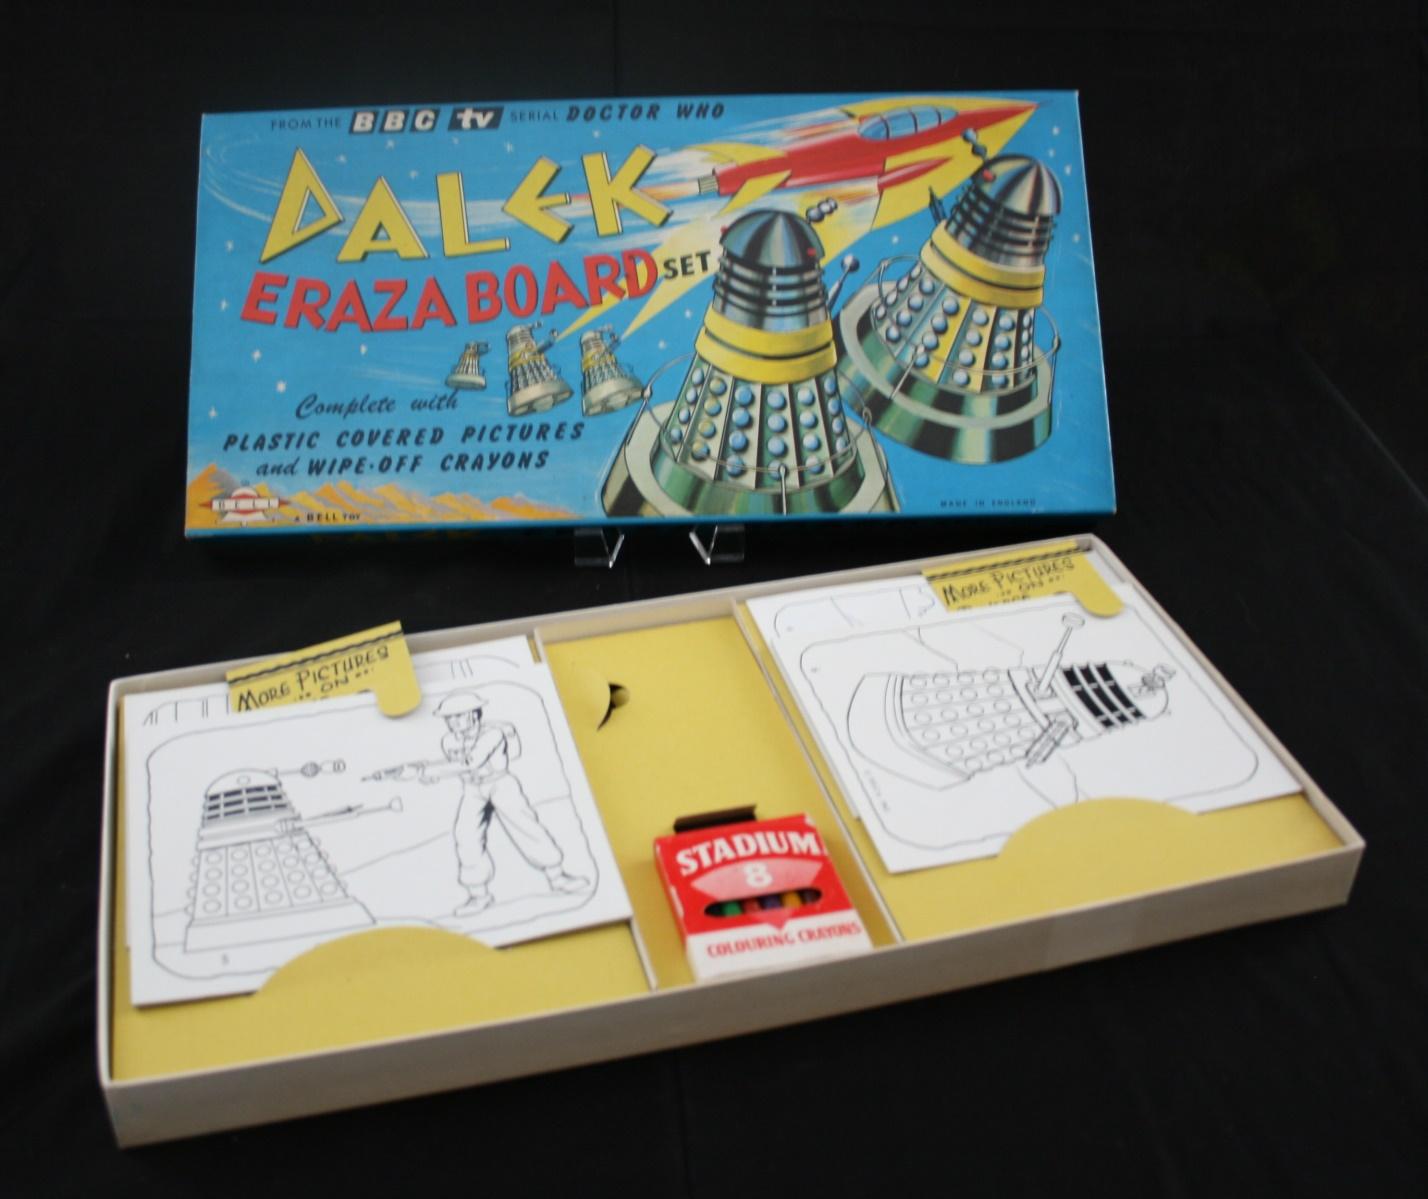 Bell Toys Ltd., Dalek Eraza-Board Set (boxed version)